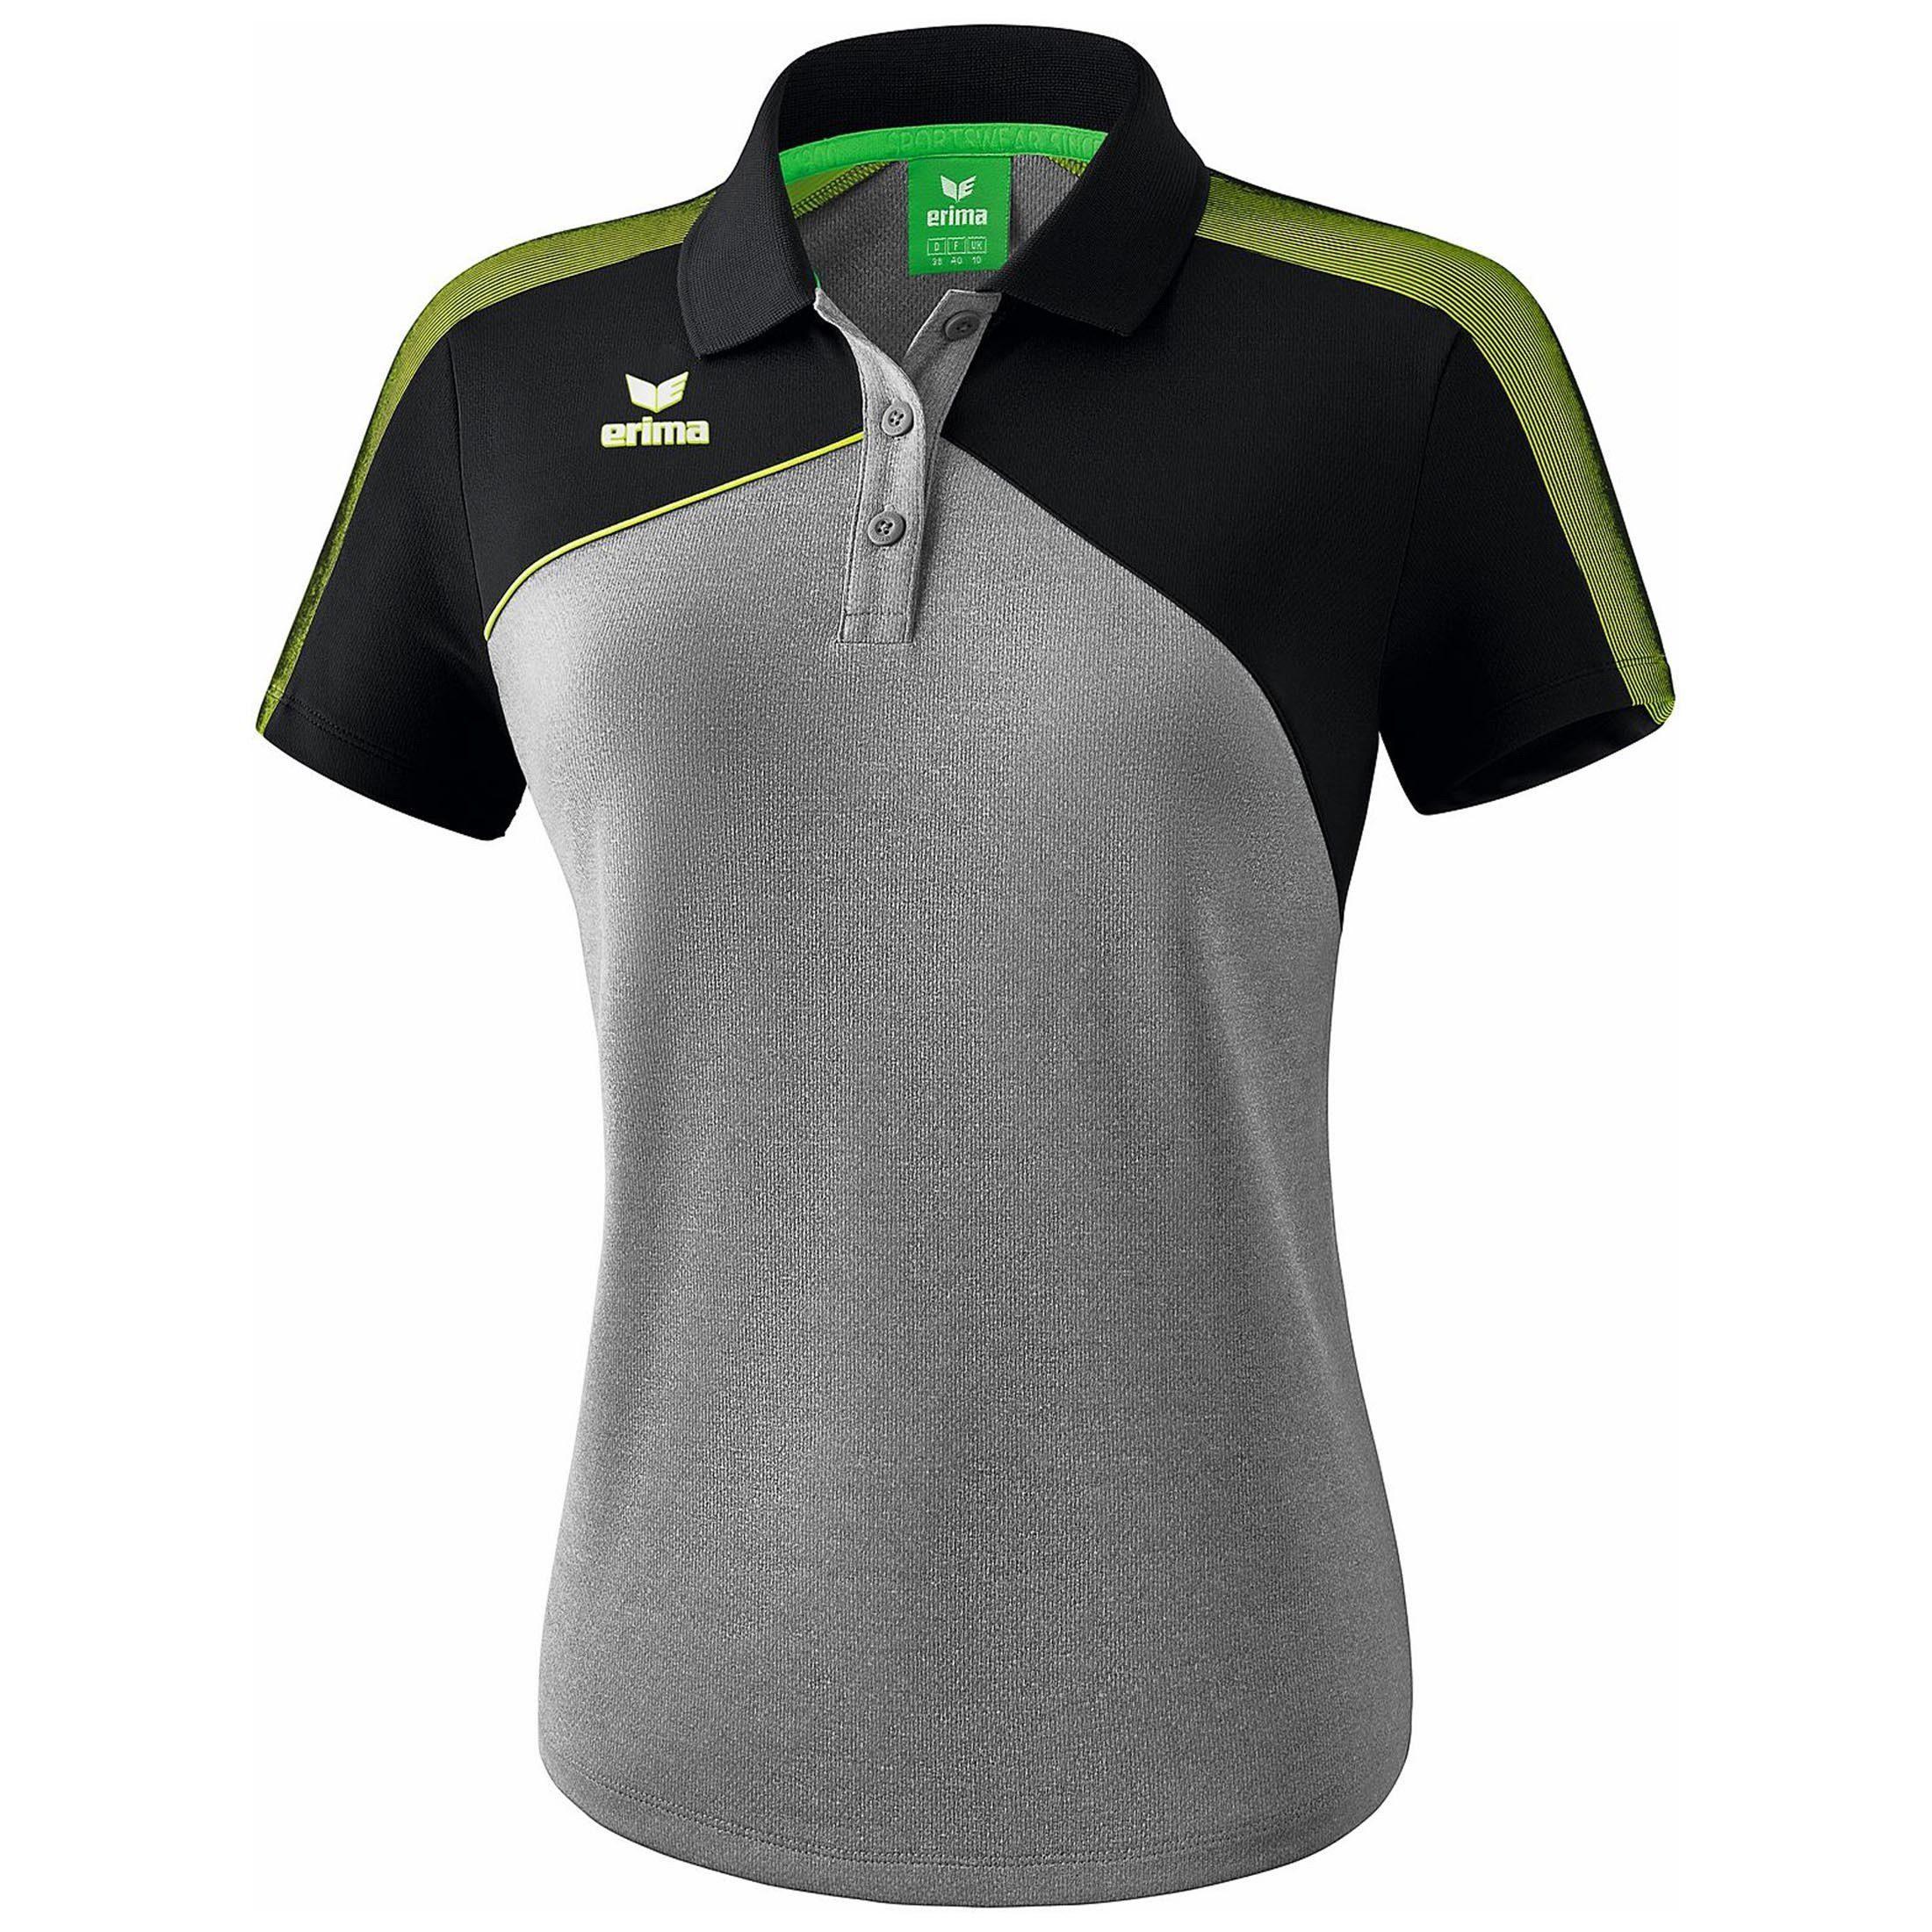 2 Poloshirt Erima Damen Kaufen 0 One Premium I9WE2DH